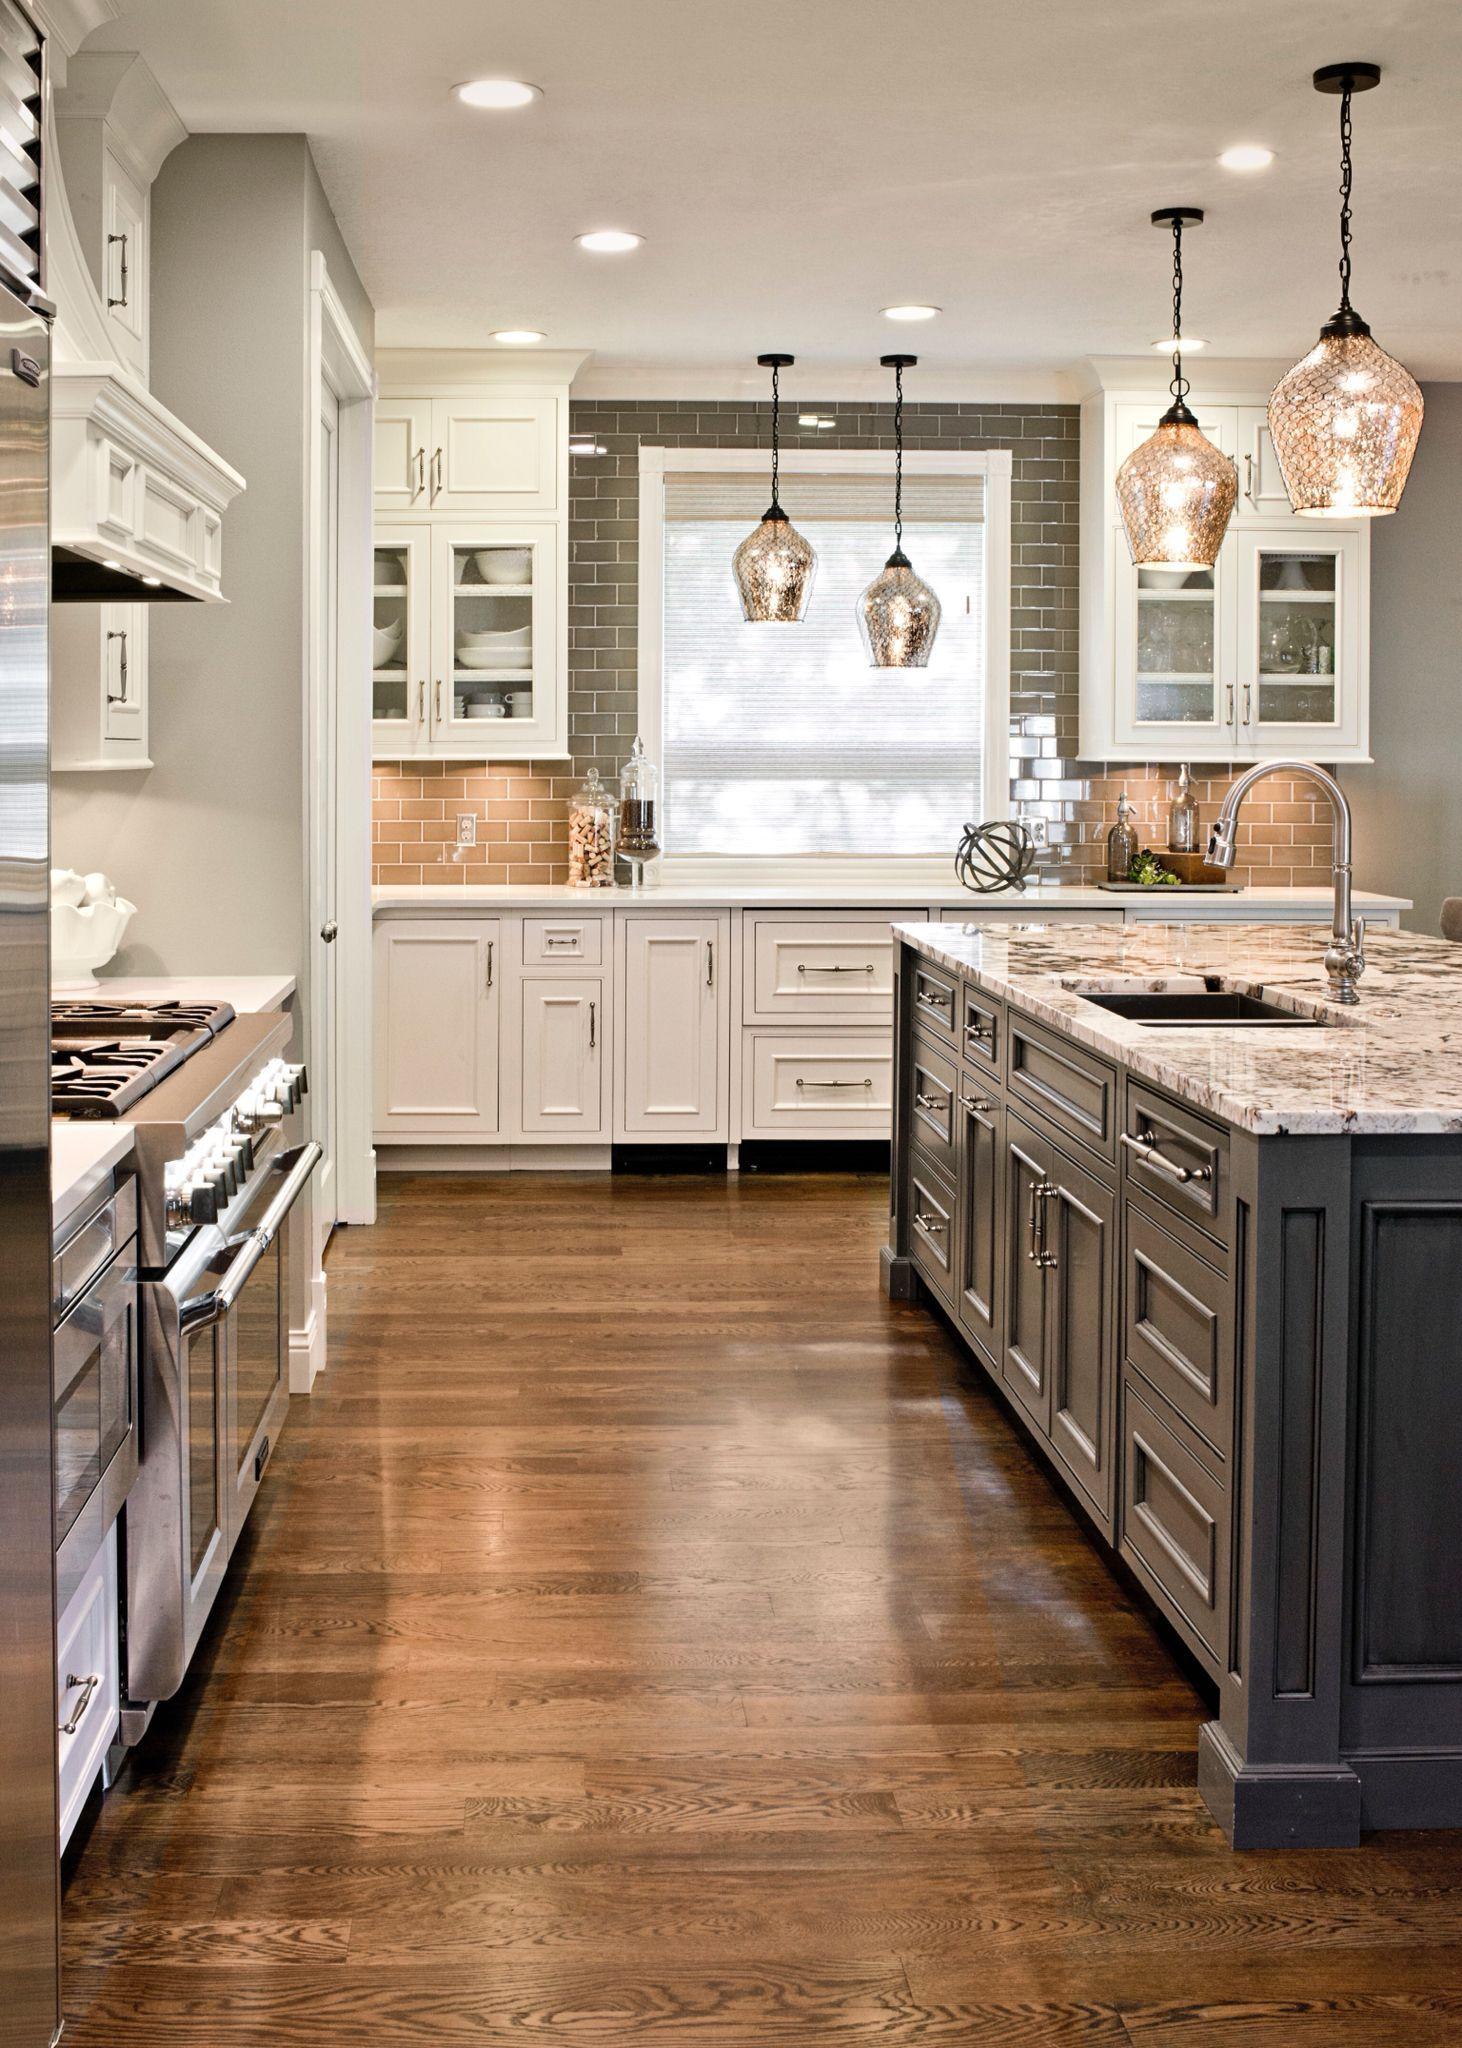 gray oak kitchen cabinets 2020 in 2020 kitchen backsplash designs kitchen tile backsplash on kitchen decor grey cabinets id=12447